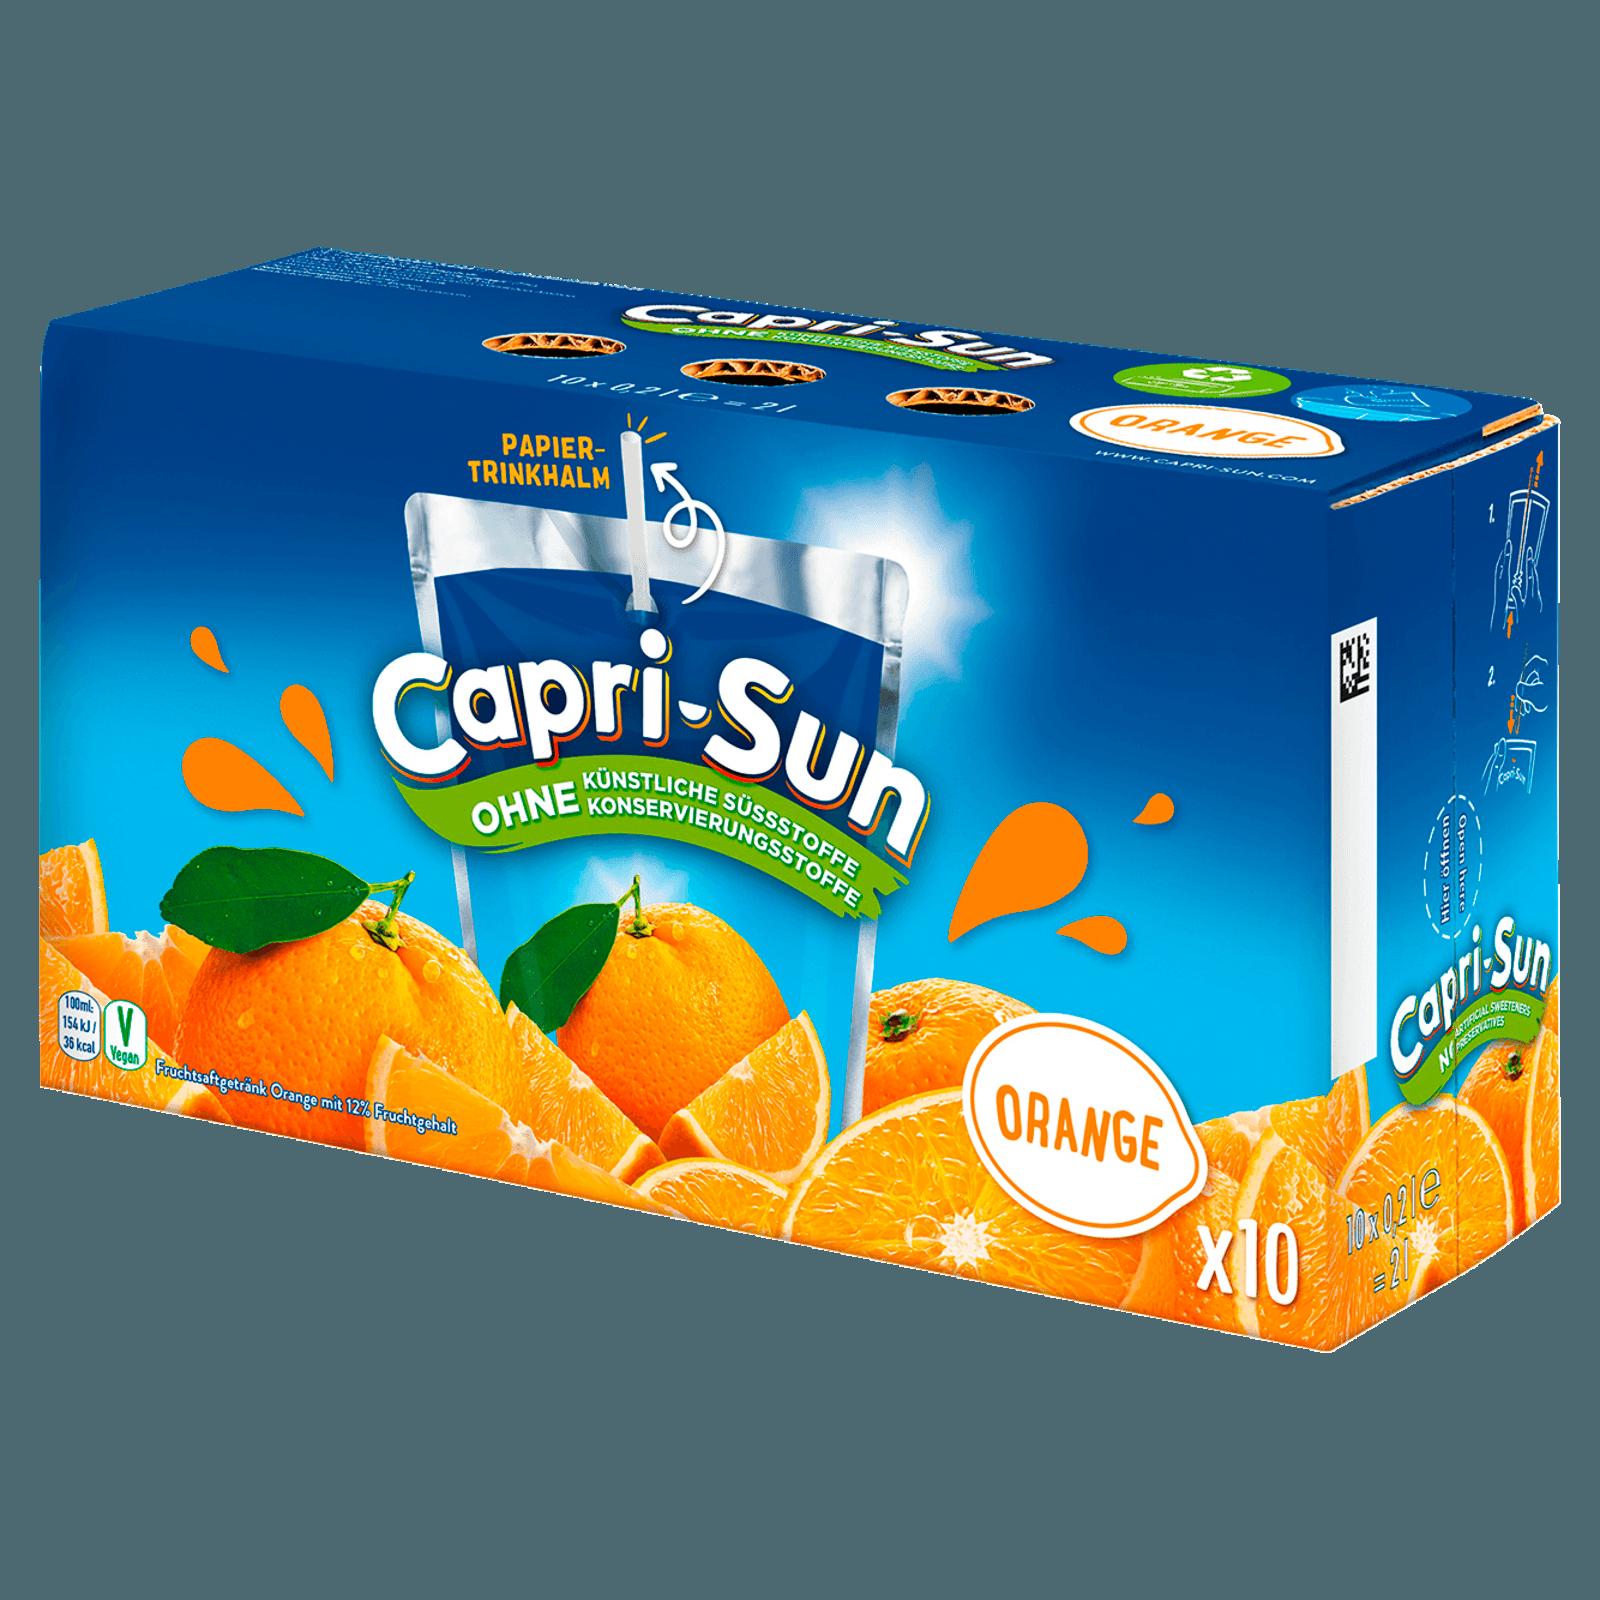 Capri Sun Orange Multipack 20x20ml bei REWE online bestellen